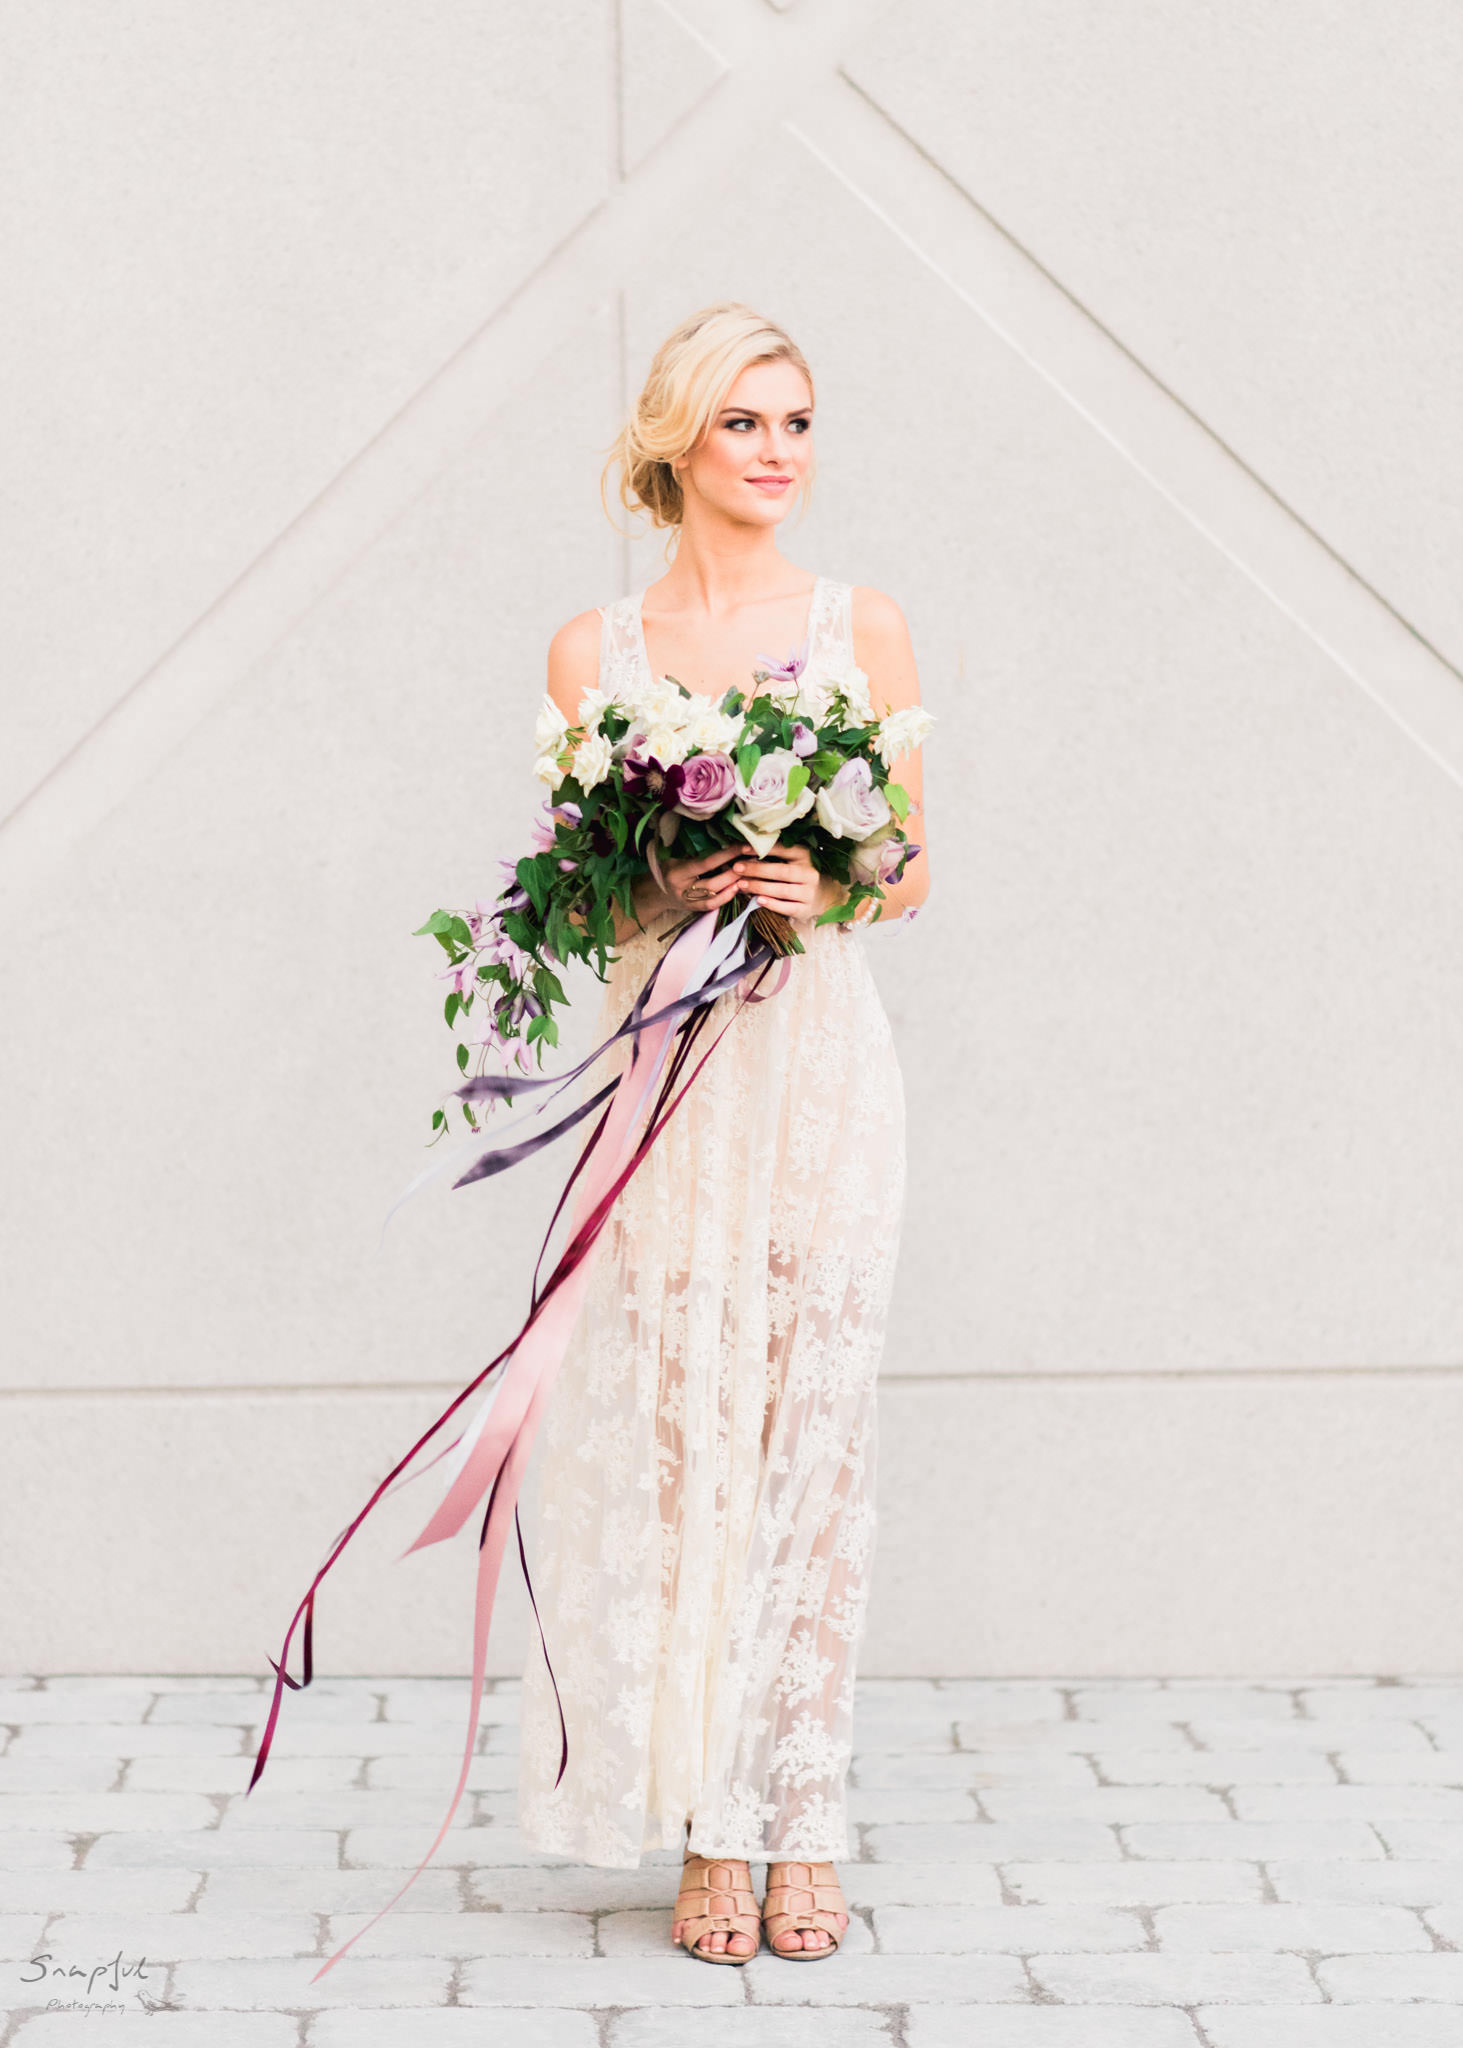 Full body portrait of bride in Toronto